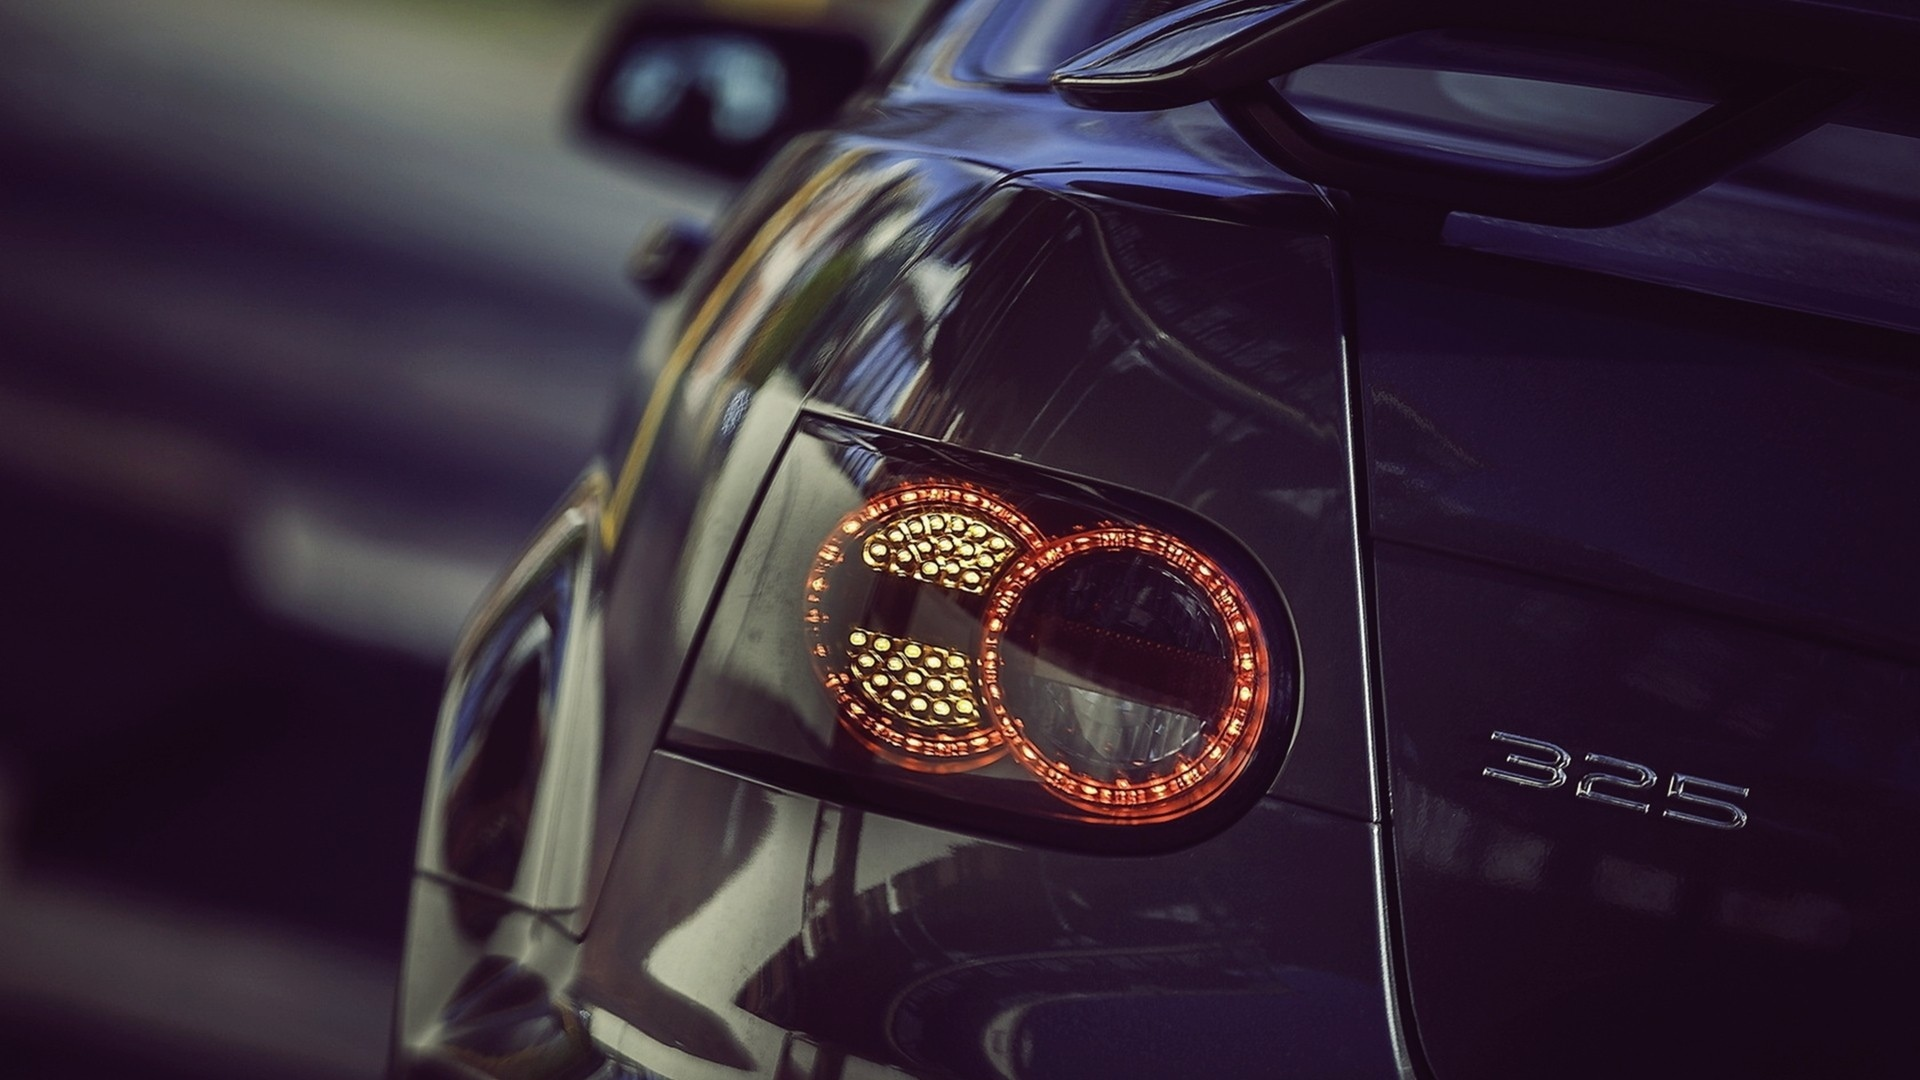 Bmw M3 Holden Monaro Lights Brake Tail Wallpaper